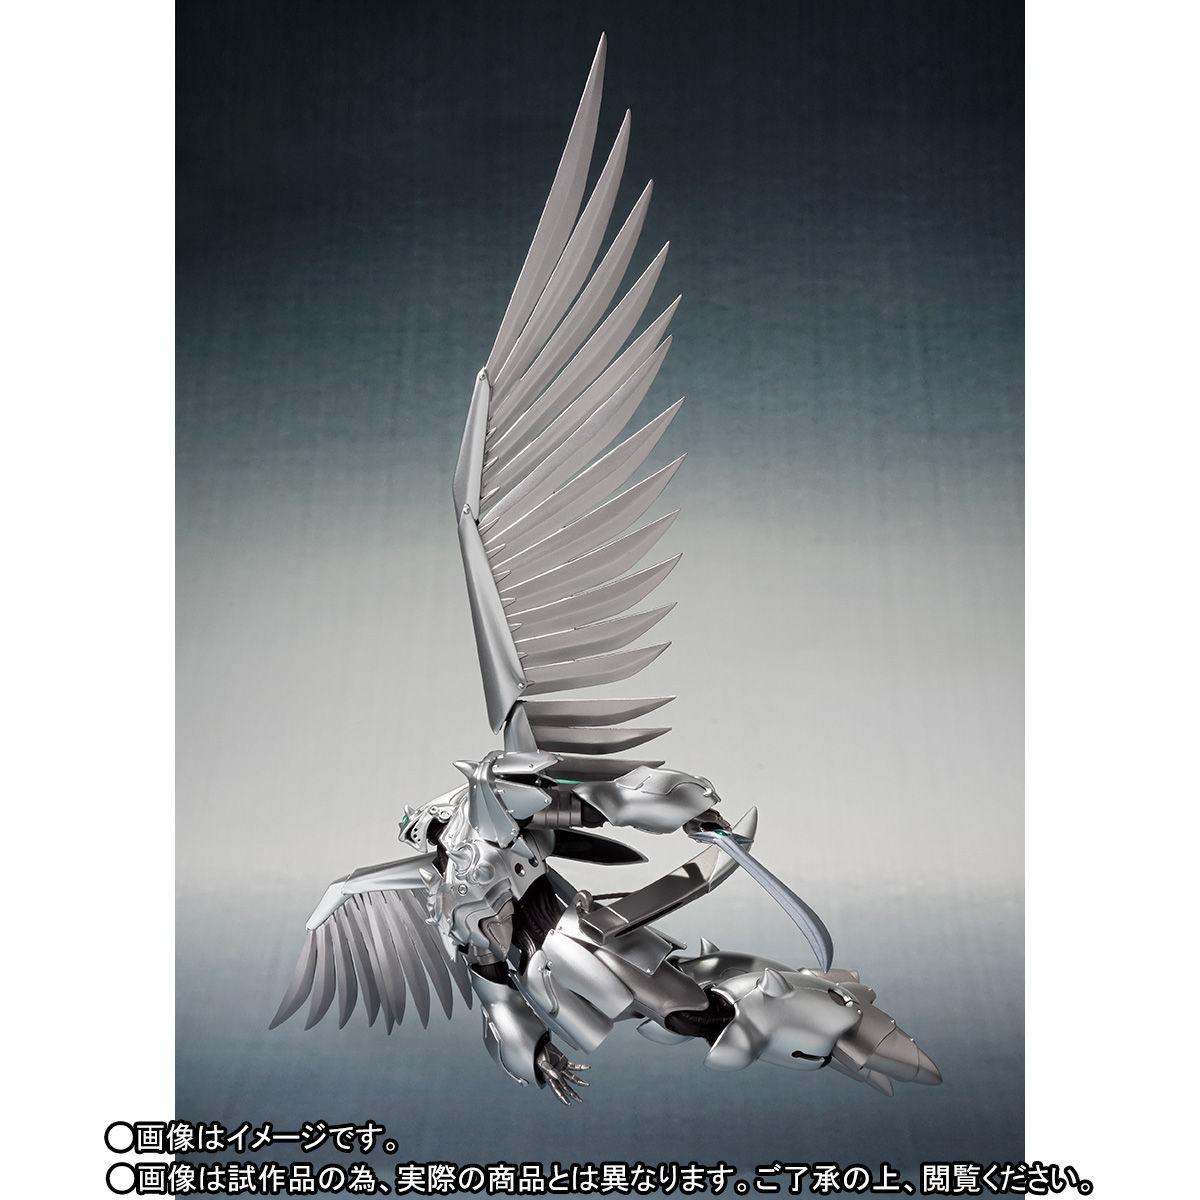 ROBOT魂〈SIDE PB〉『飛甲兵』機甲界ガリアン 鉄の紋章 可動フィギュア-006